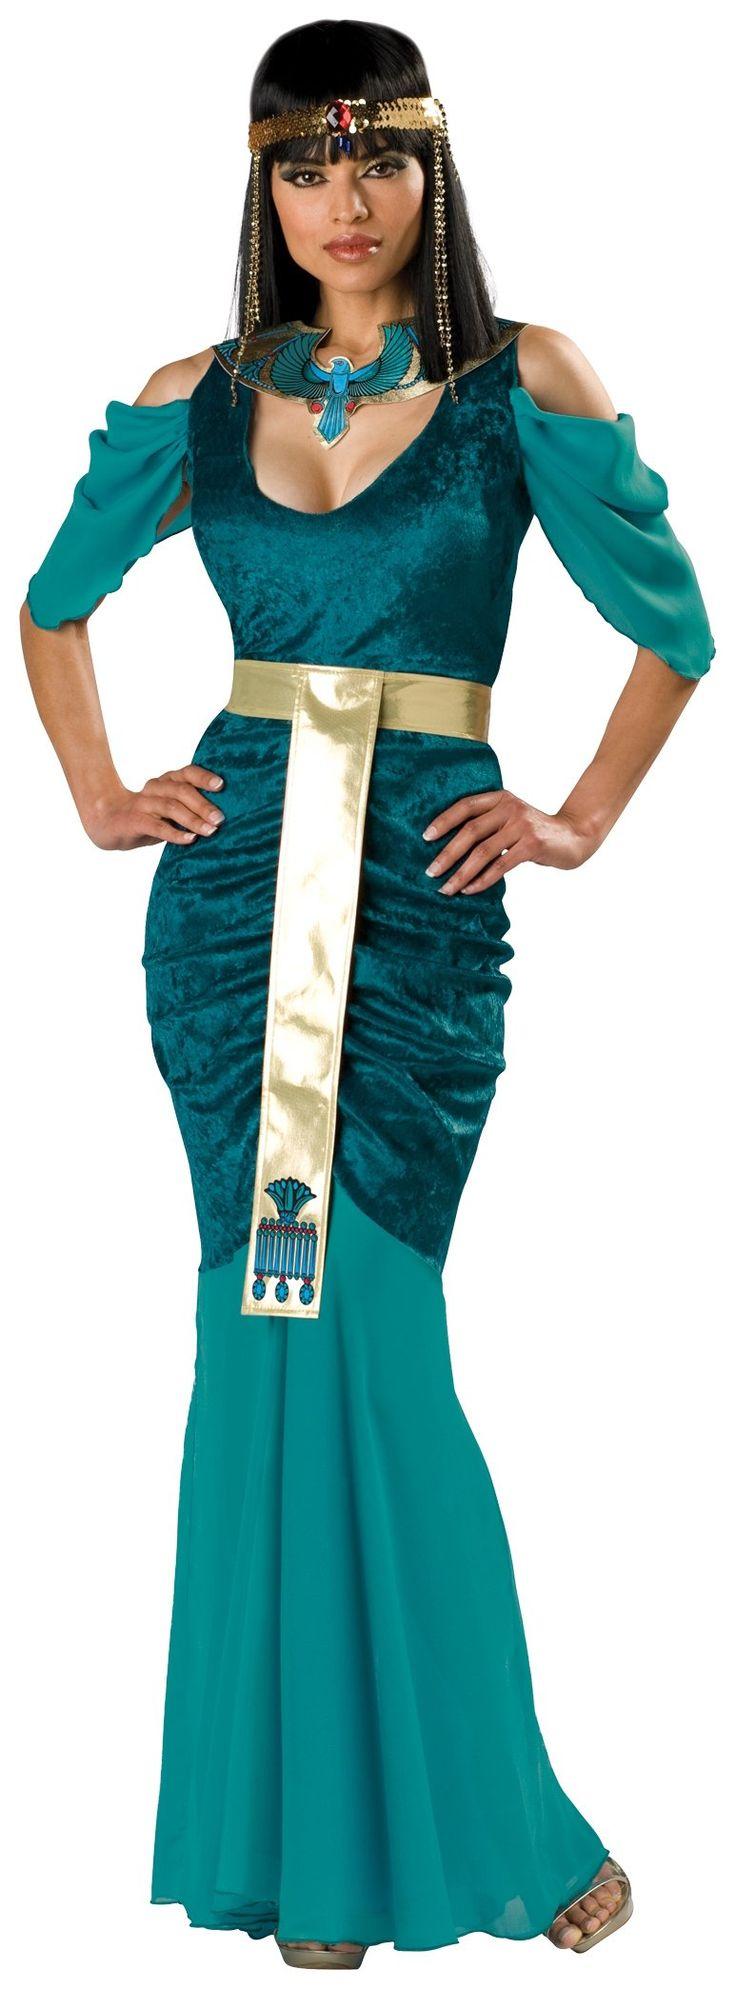 7 best Cleopatra Halloween Costume images on Pinterest